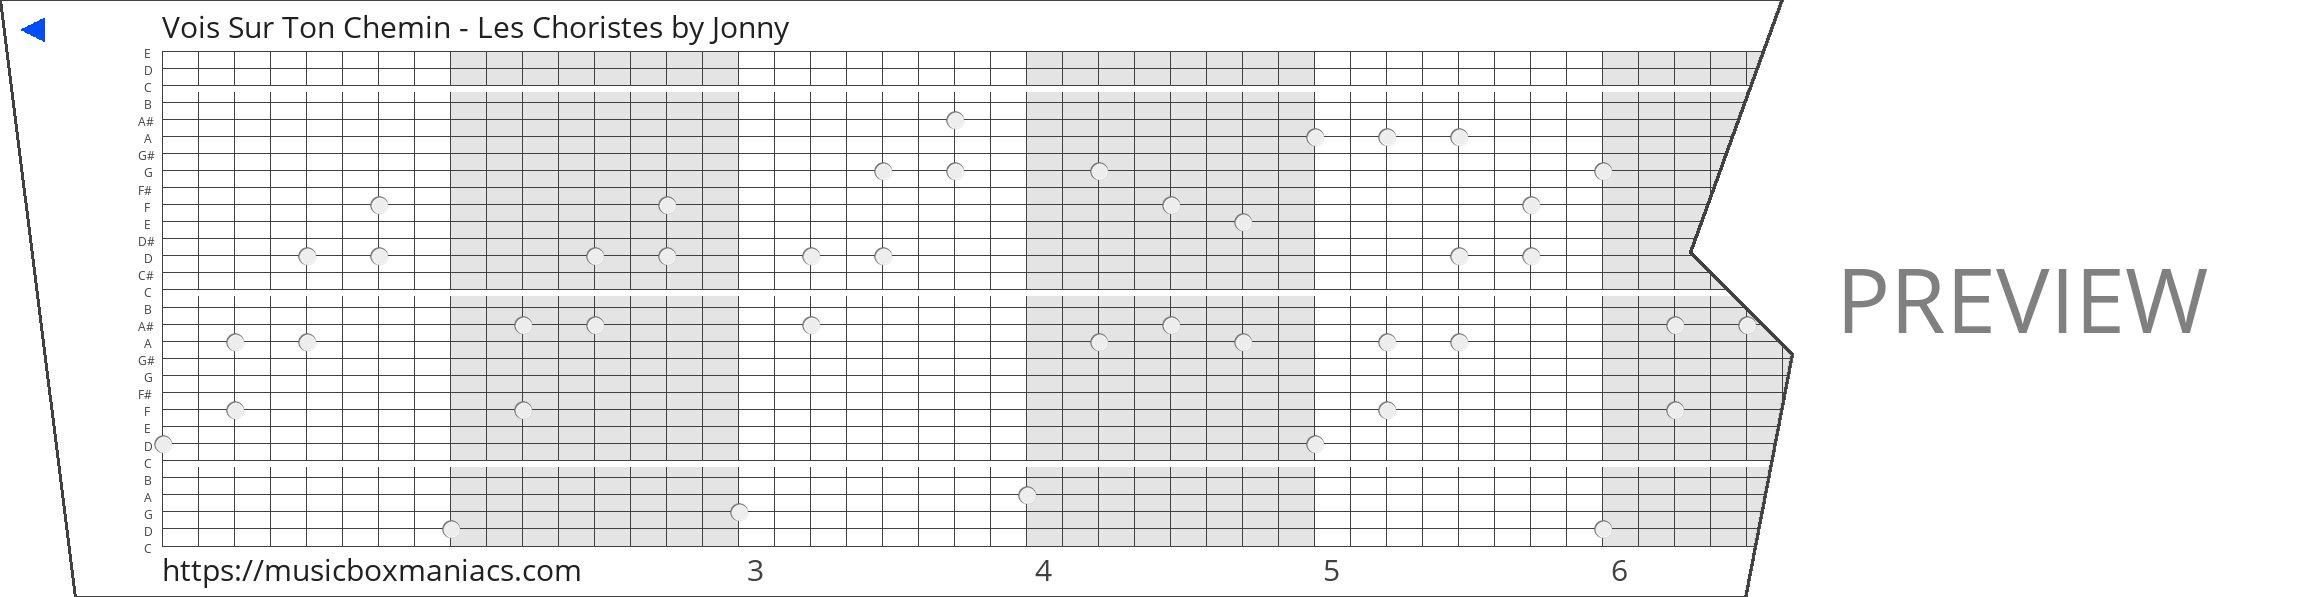 Vois Sur Ton Chemin - Les Choristes 30 note music box paper strip